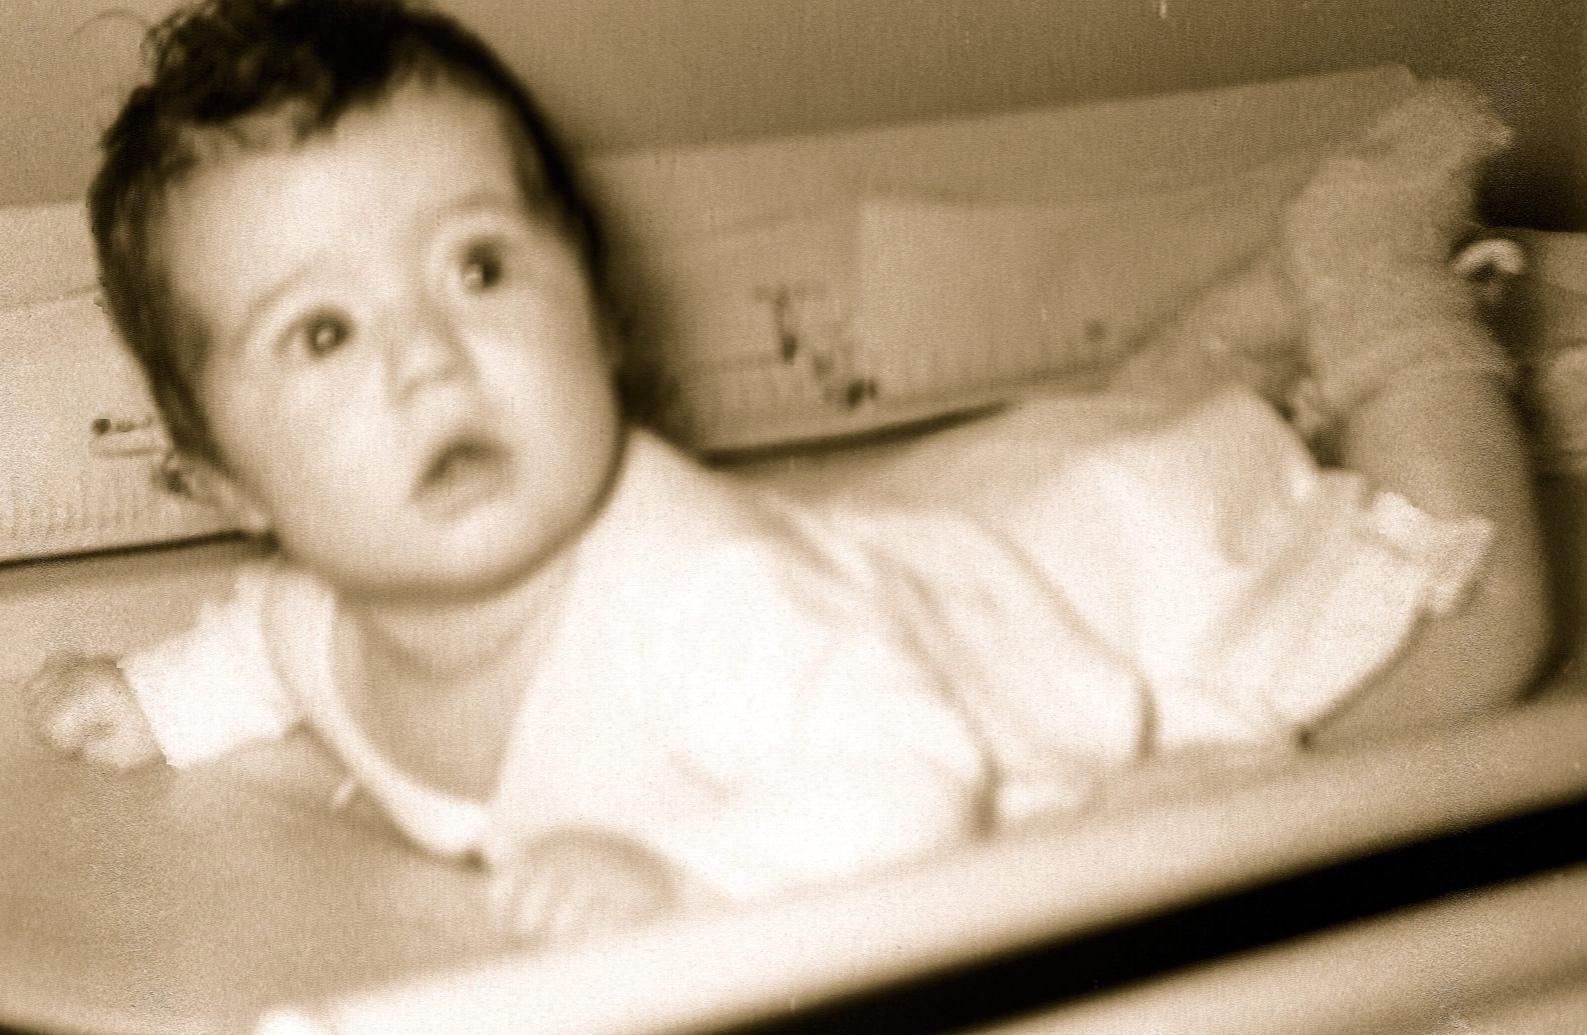 baby-Fern-sepia.jpg